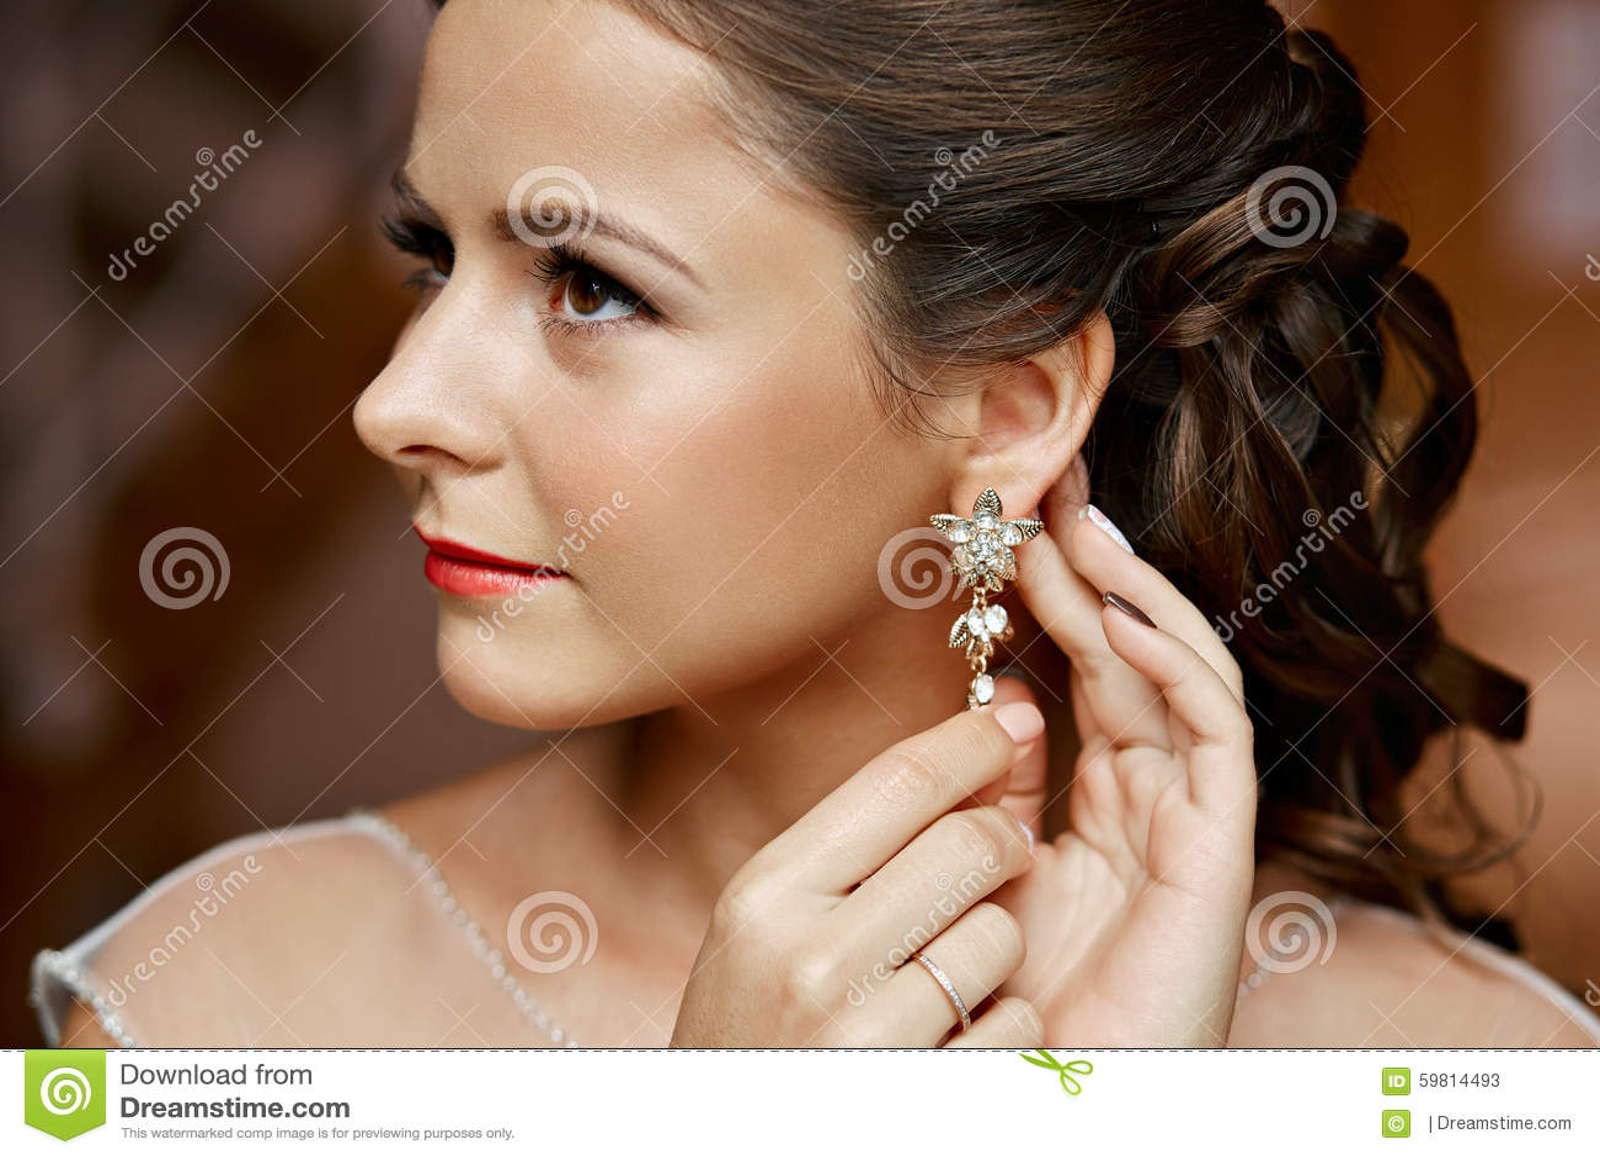 Woman With Diamond Earrings Royalty